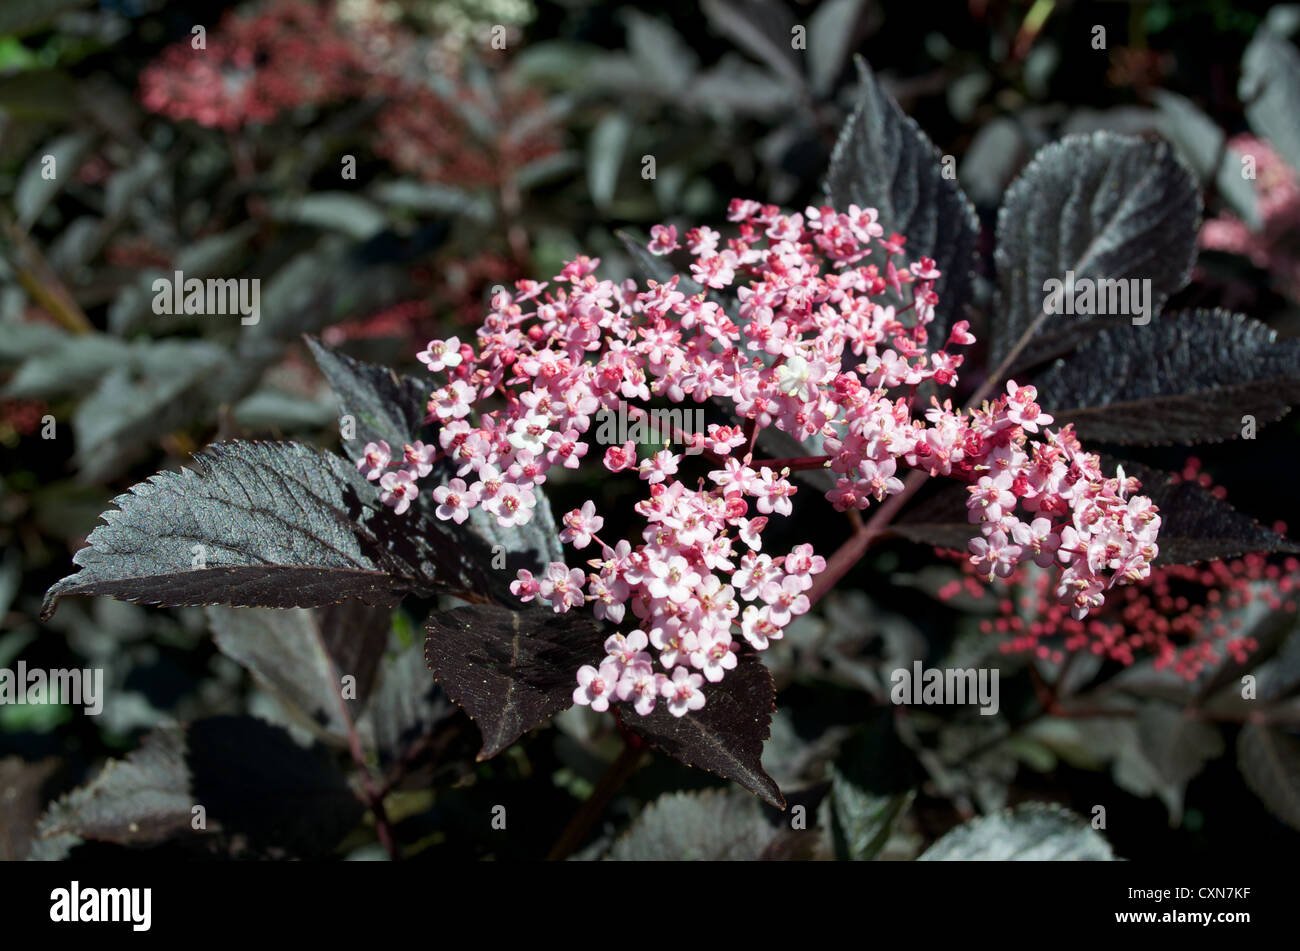 19c04319a8e0 purple elderflower sambucus Stock Photo  50868819 - Alamy